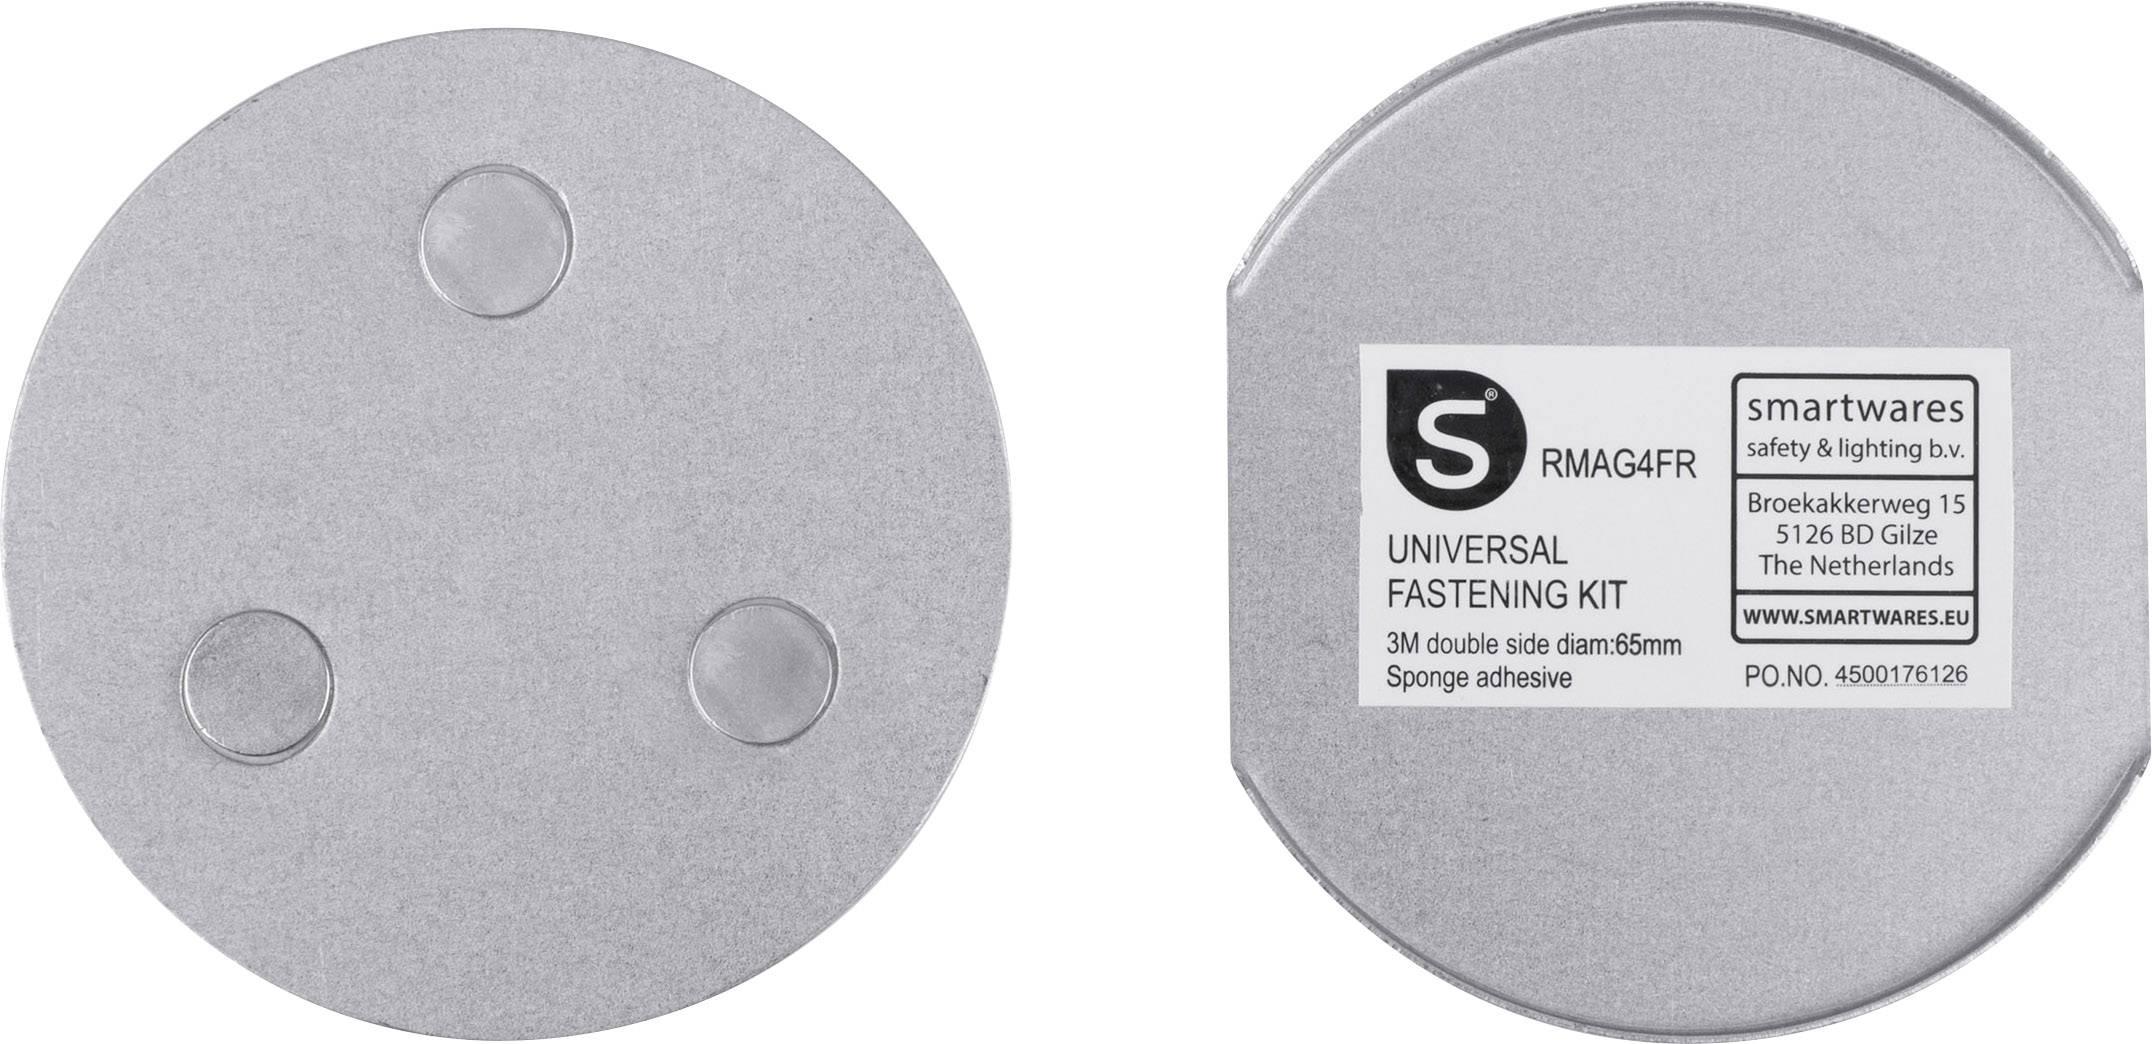 Magnetický držák detektoru kouře Smartwares RMAG4 RMAG4